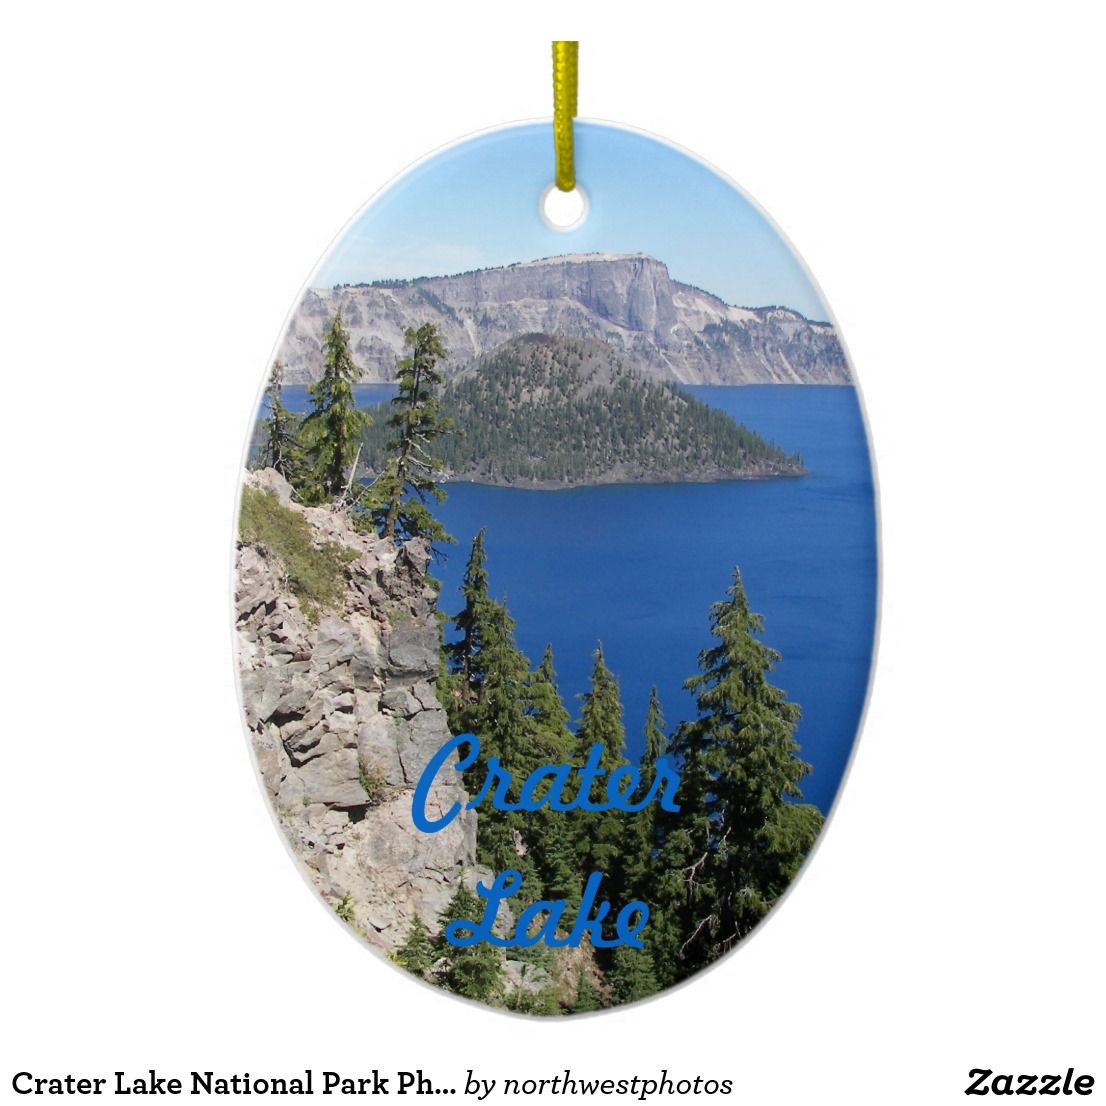 Crater Lake National Park Photo Ceramic Ornament | Zazzle.com #craterlakenationalpark